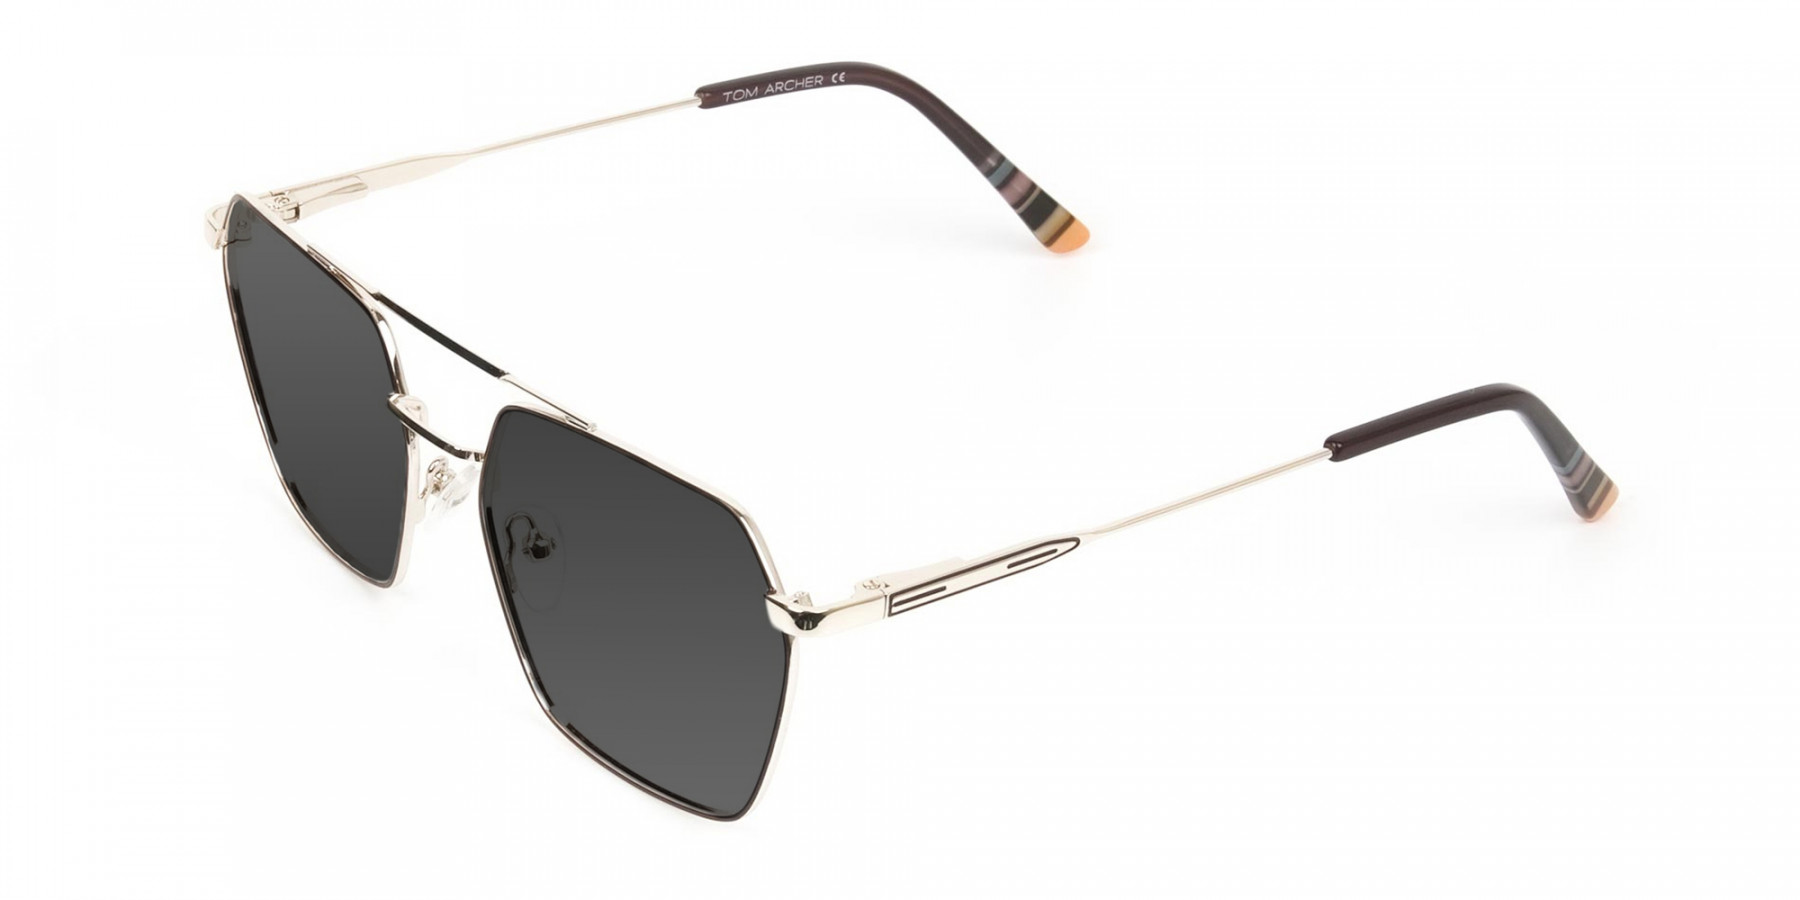 gold-gunmetal-dark-grey-tinted-geometric-aviator-sunglasses-frames-3